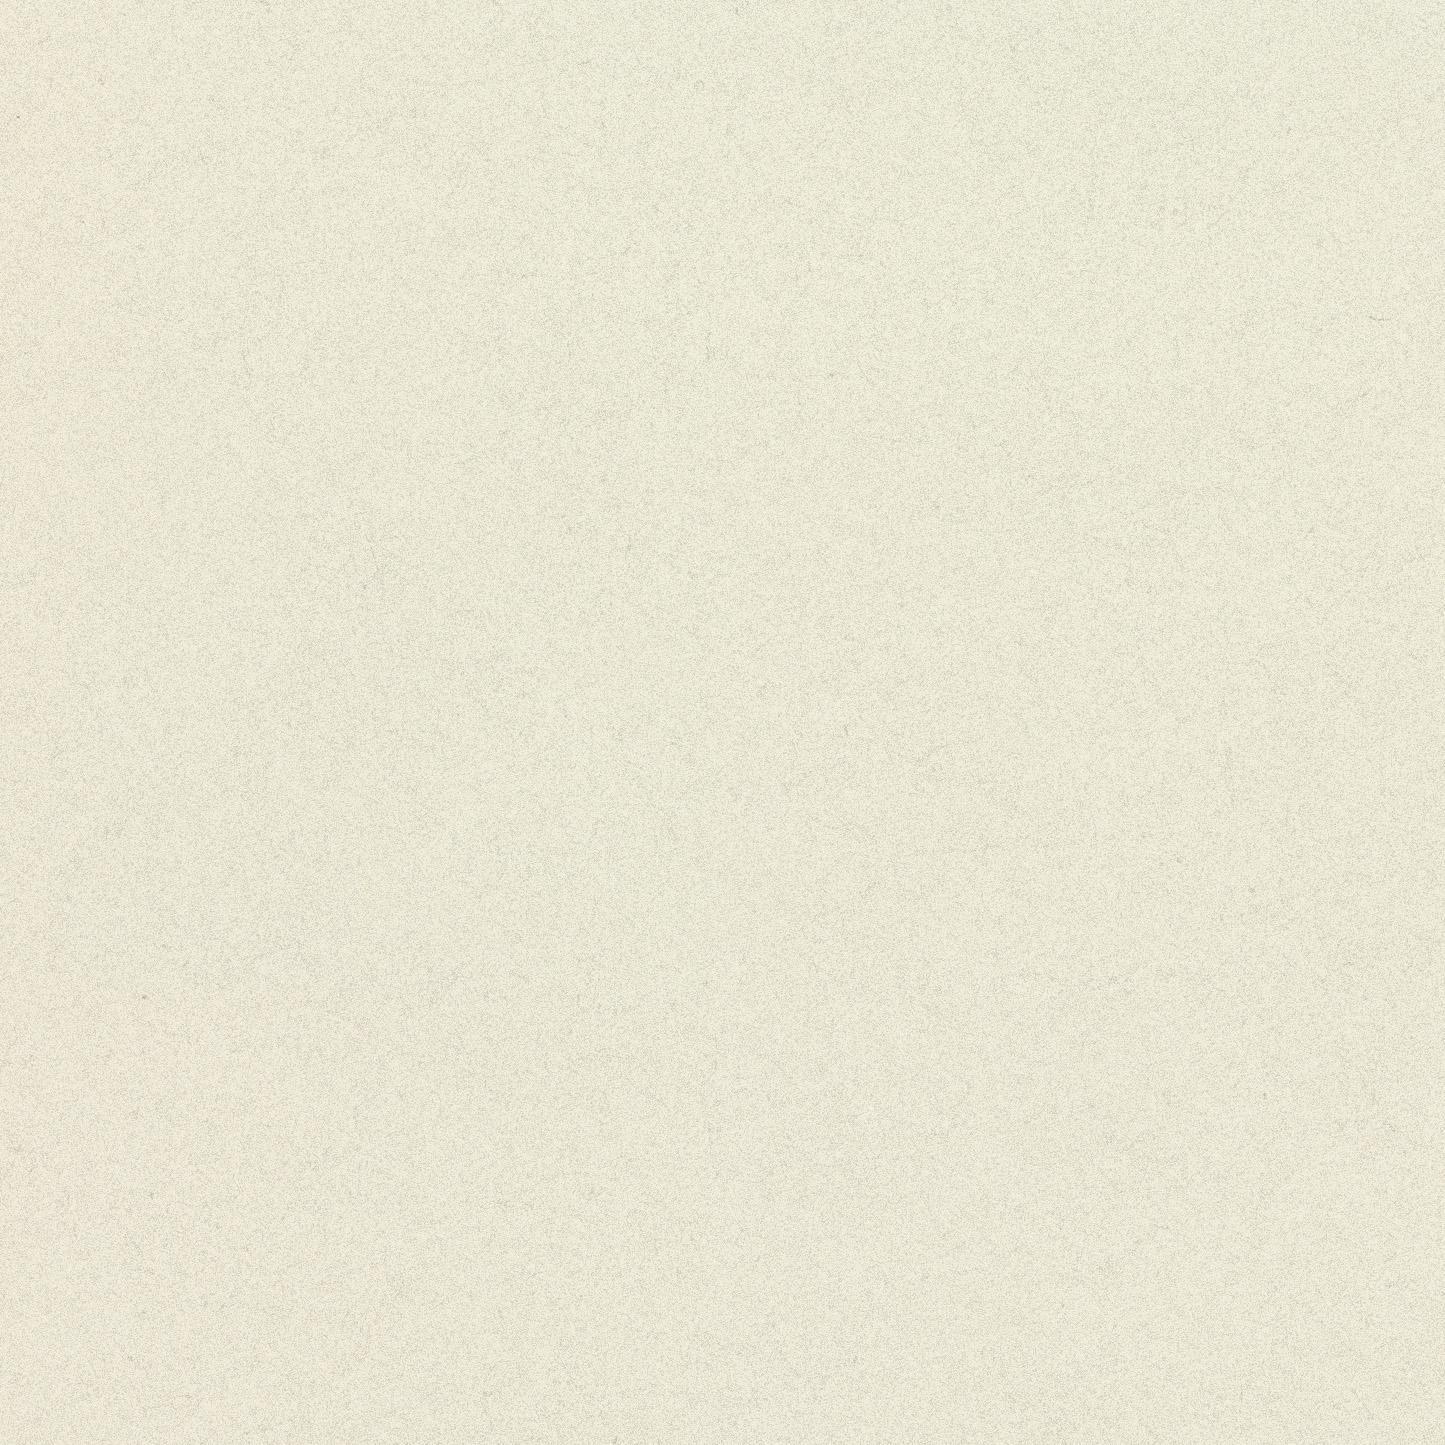 Translucent - Ivory 100gsm